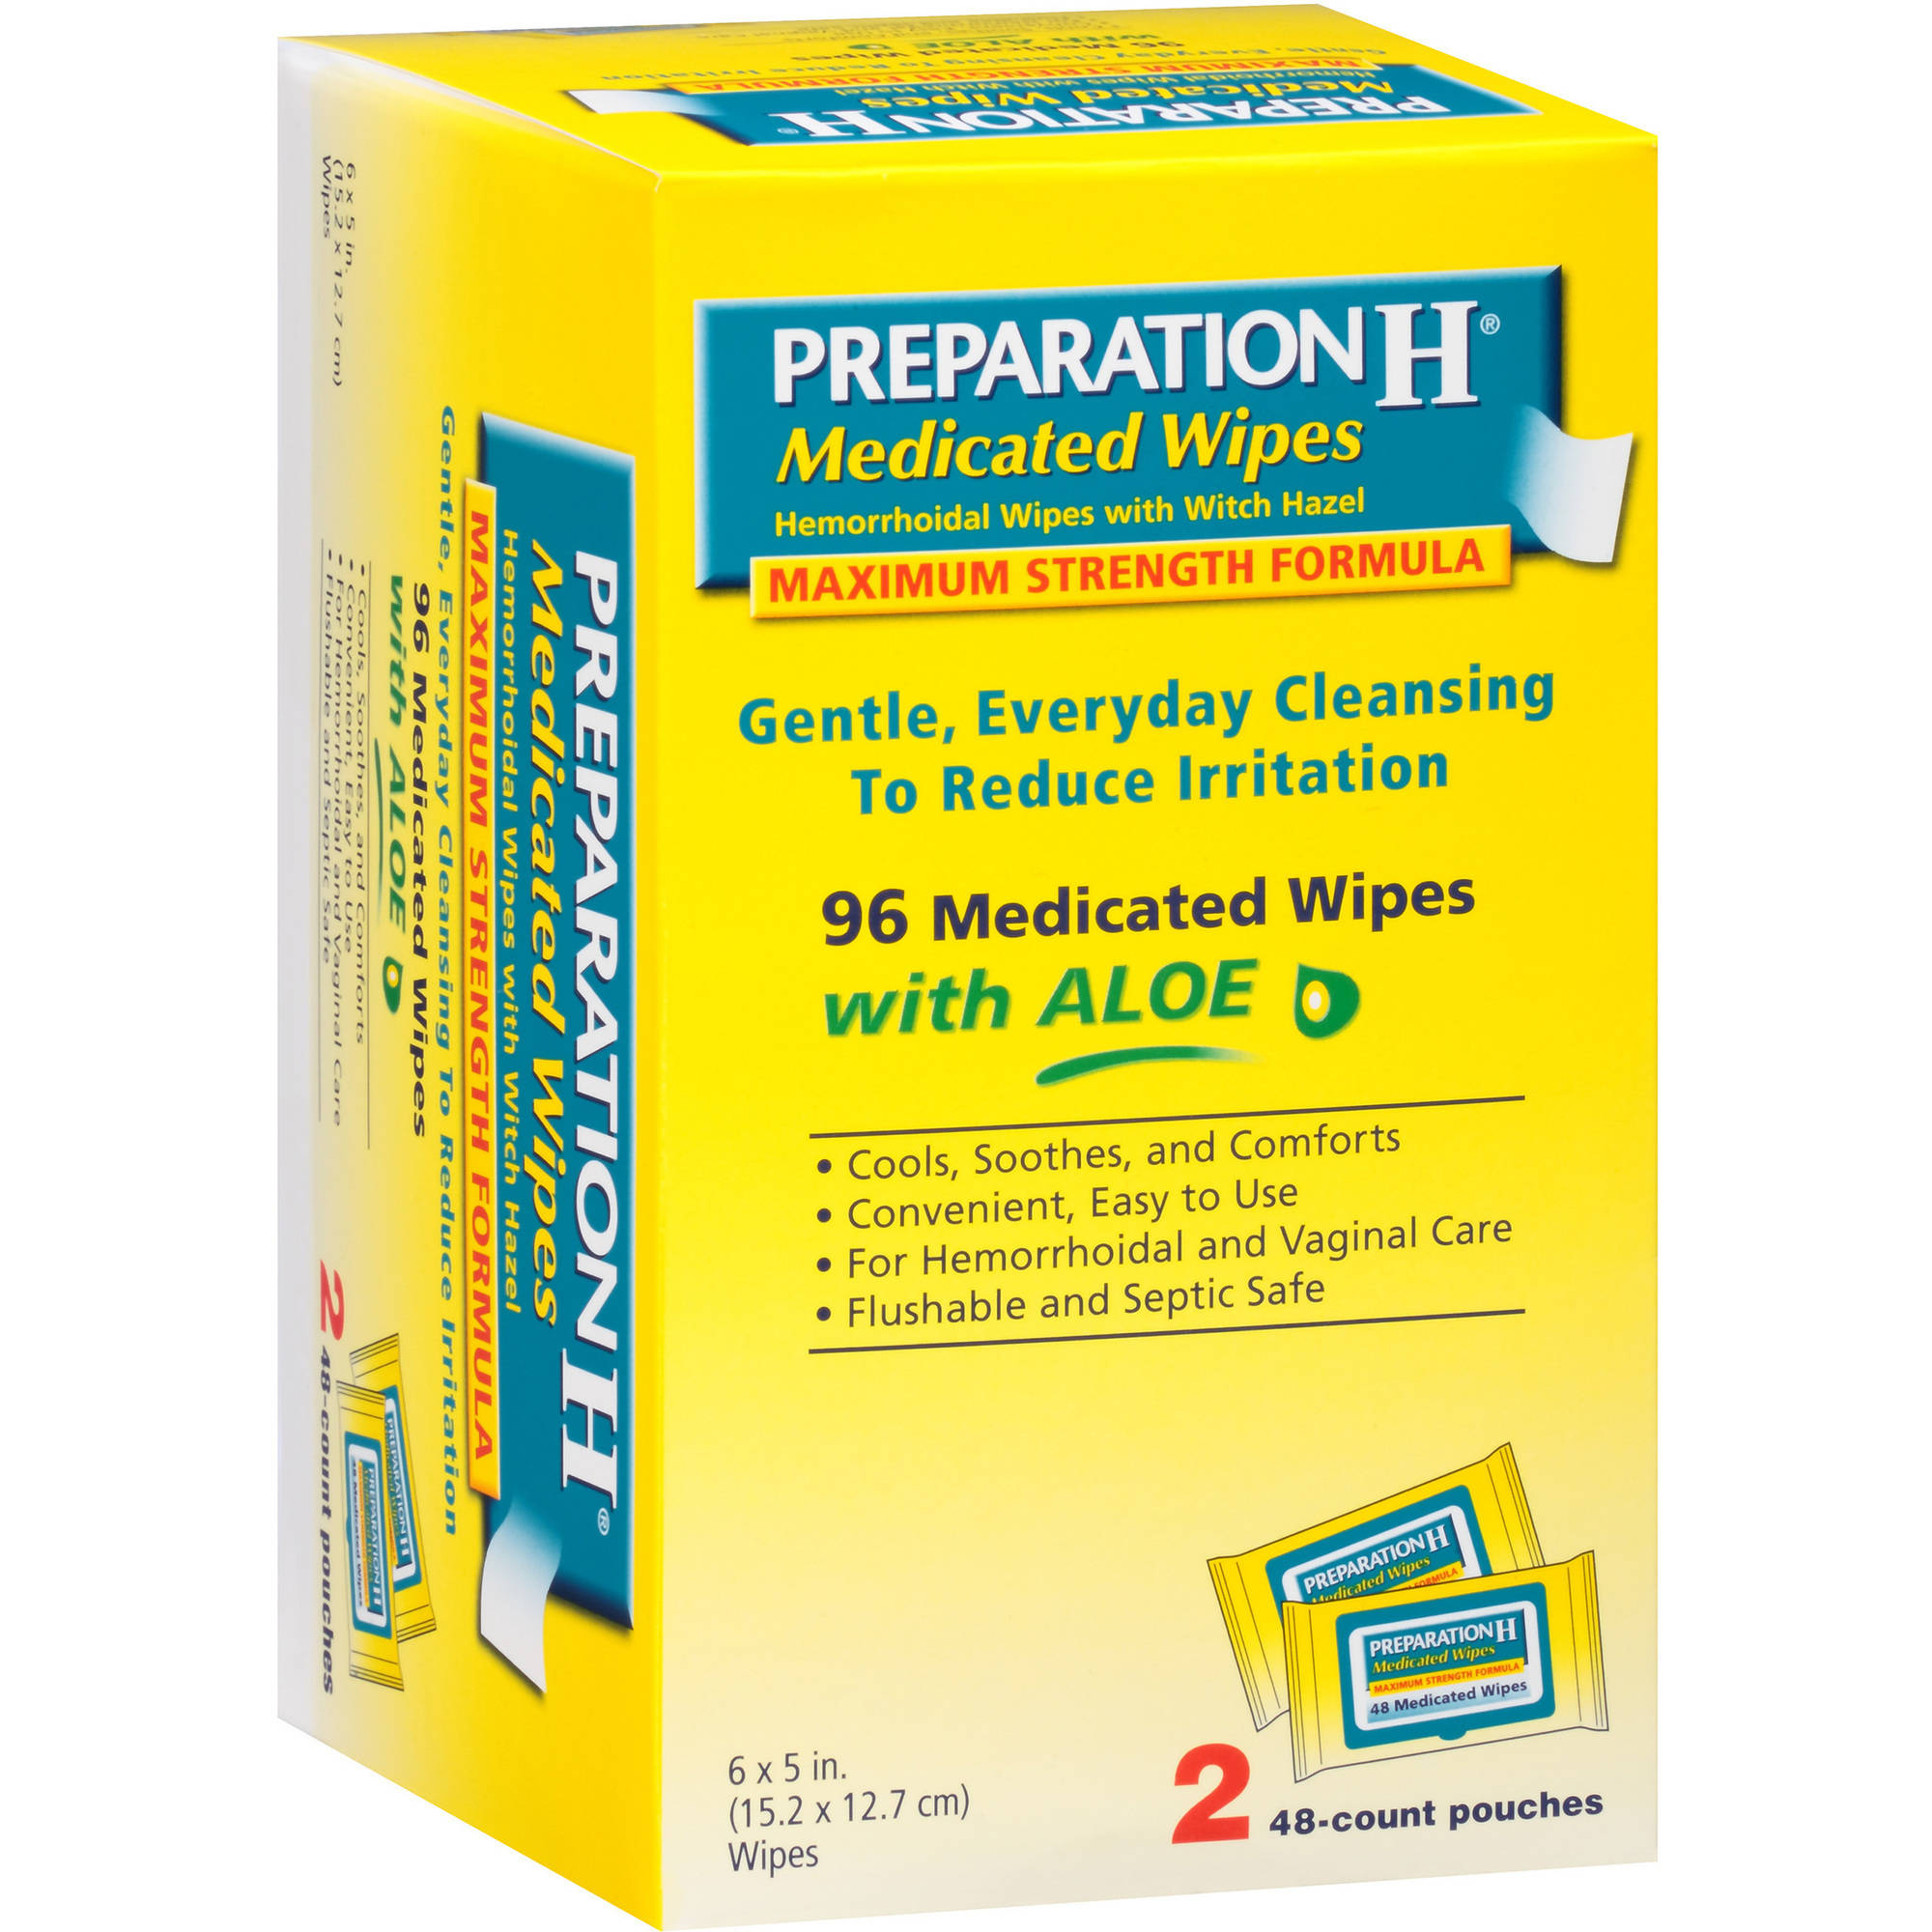 Preparation H Preparation H Wipes, 96 CT